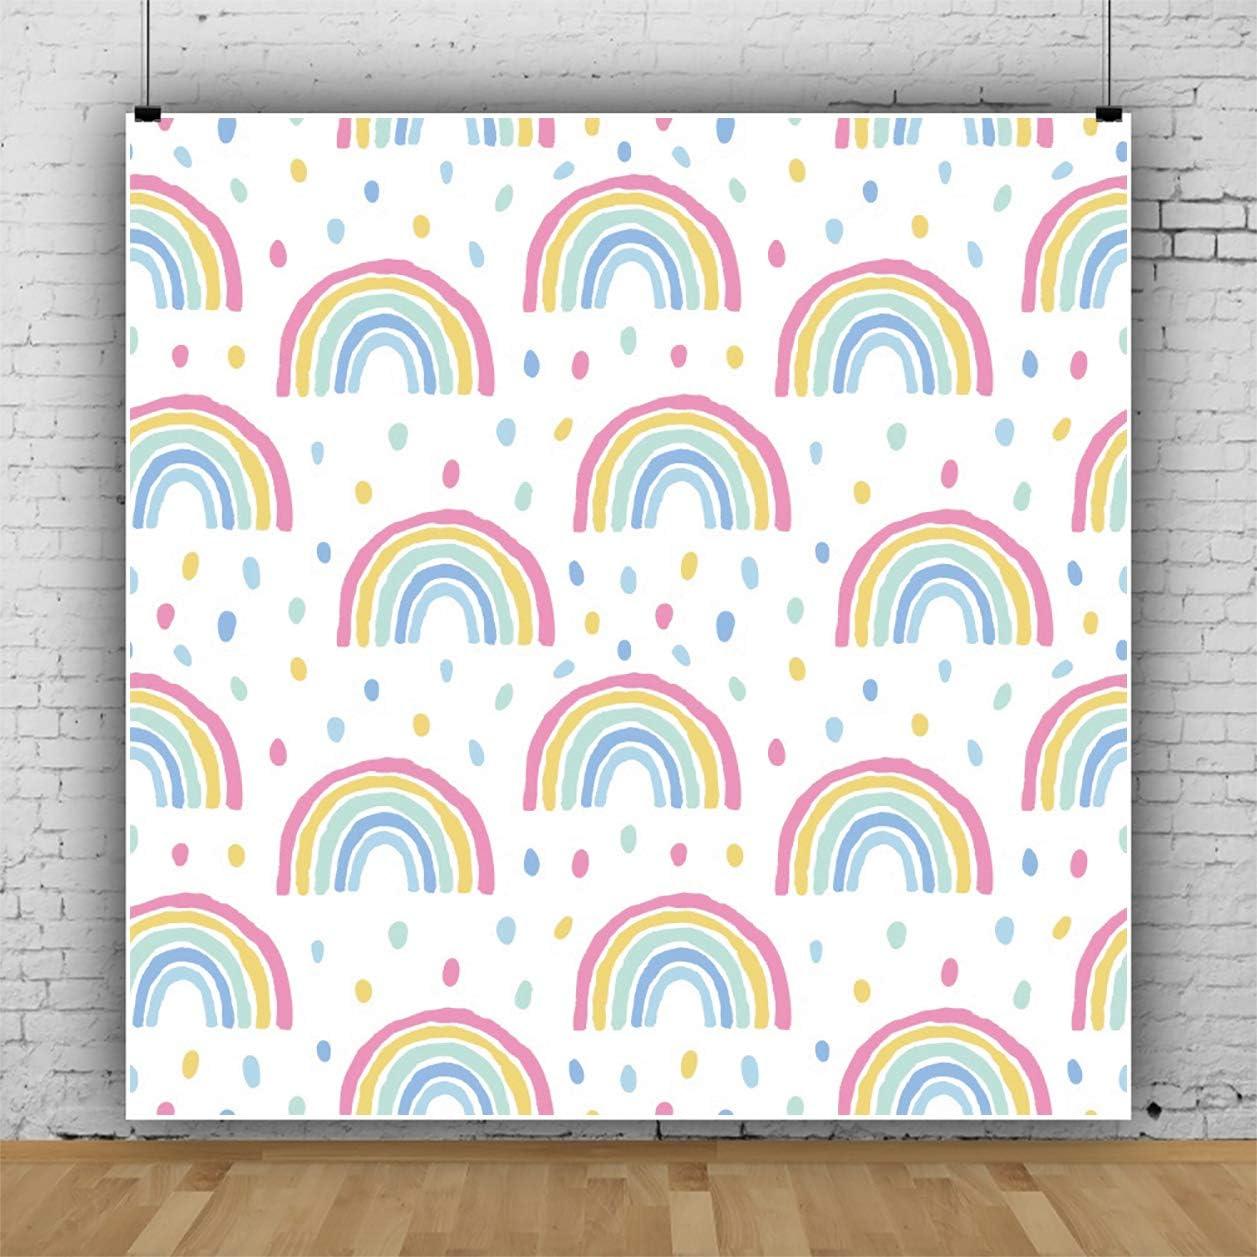 YEELE Rainbow and Raindrops Backdrop 6.5x6.5ft Pastel Color Baby Shower Photography Background Birthday Party Kindergarten Children Nursery Room Decoration Photo Booth Props Vinyl Studio Wallpaper